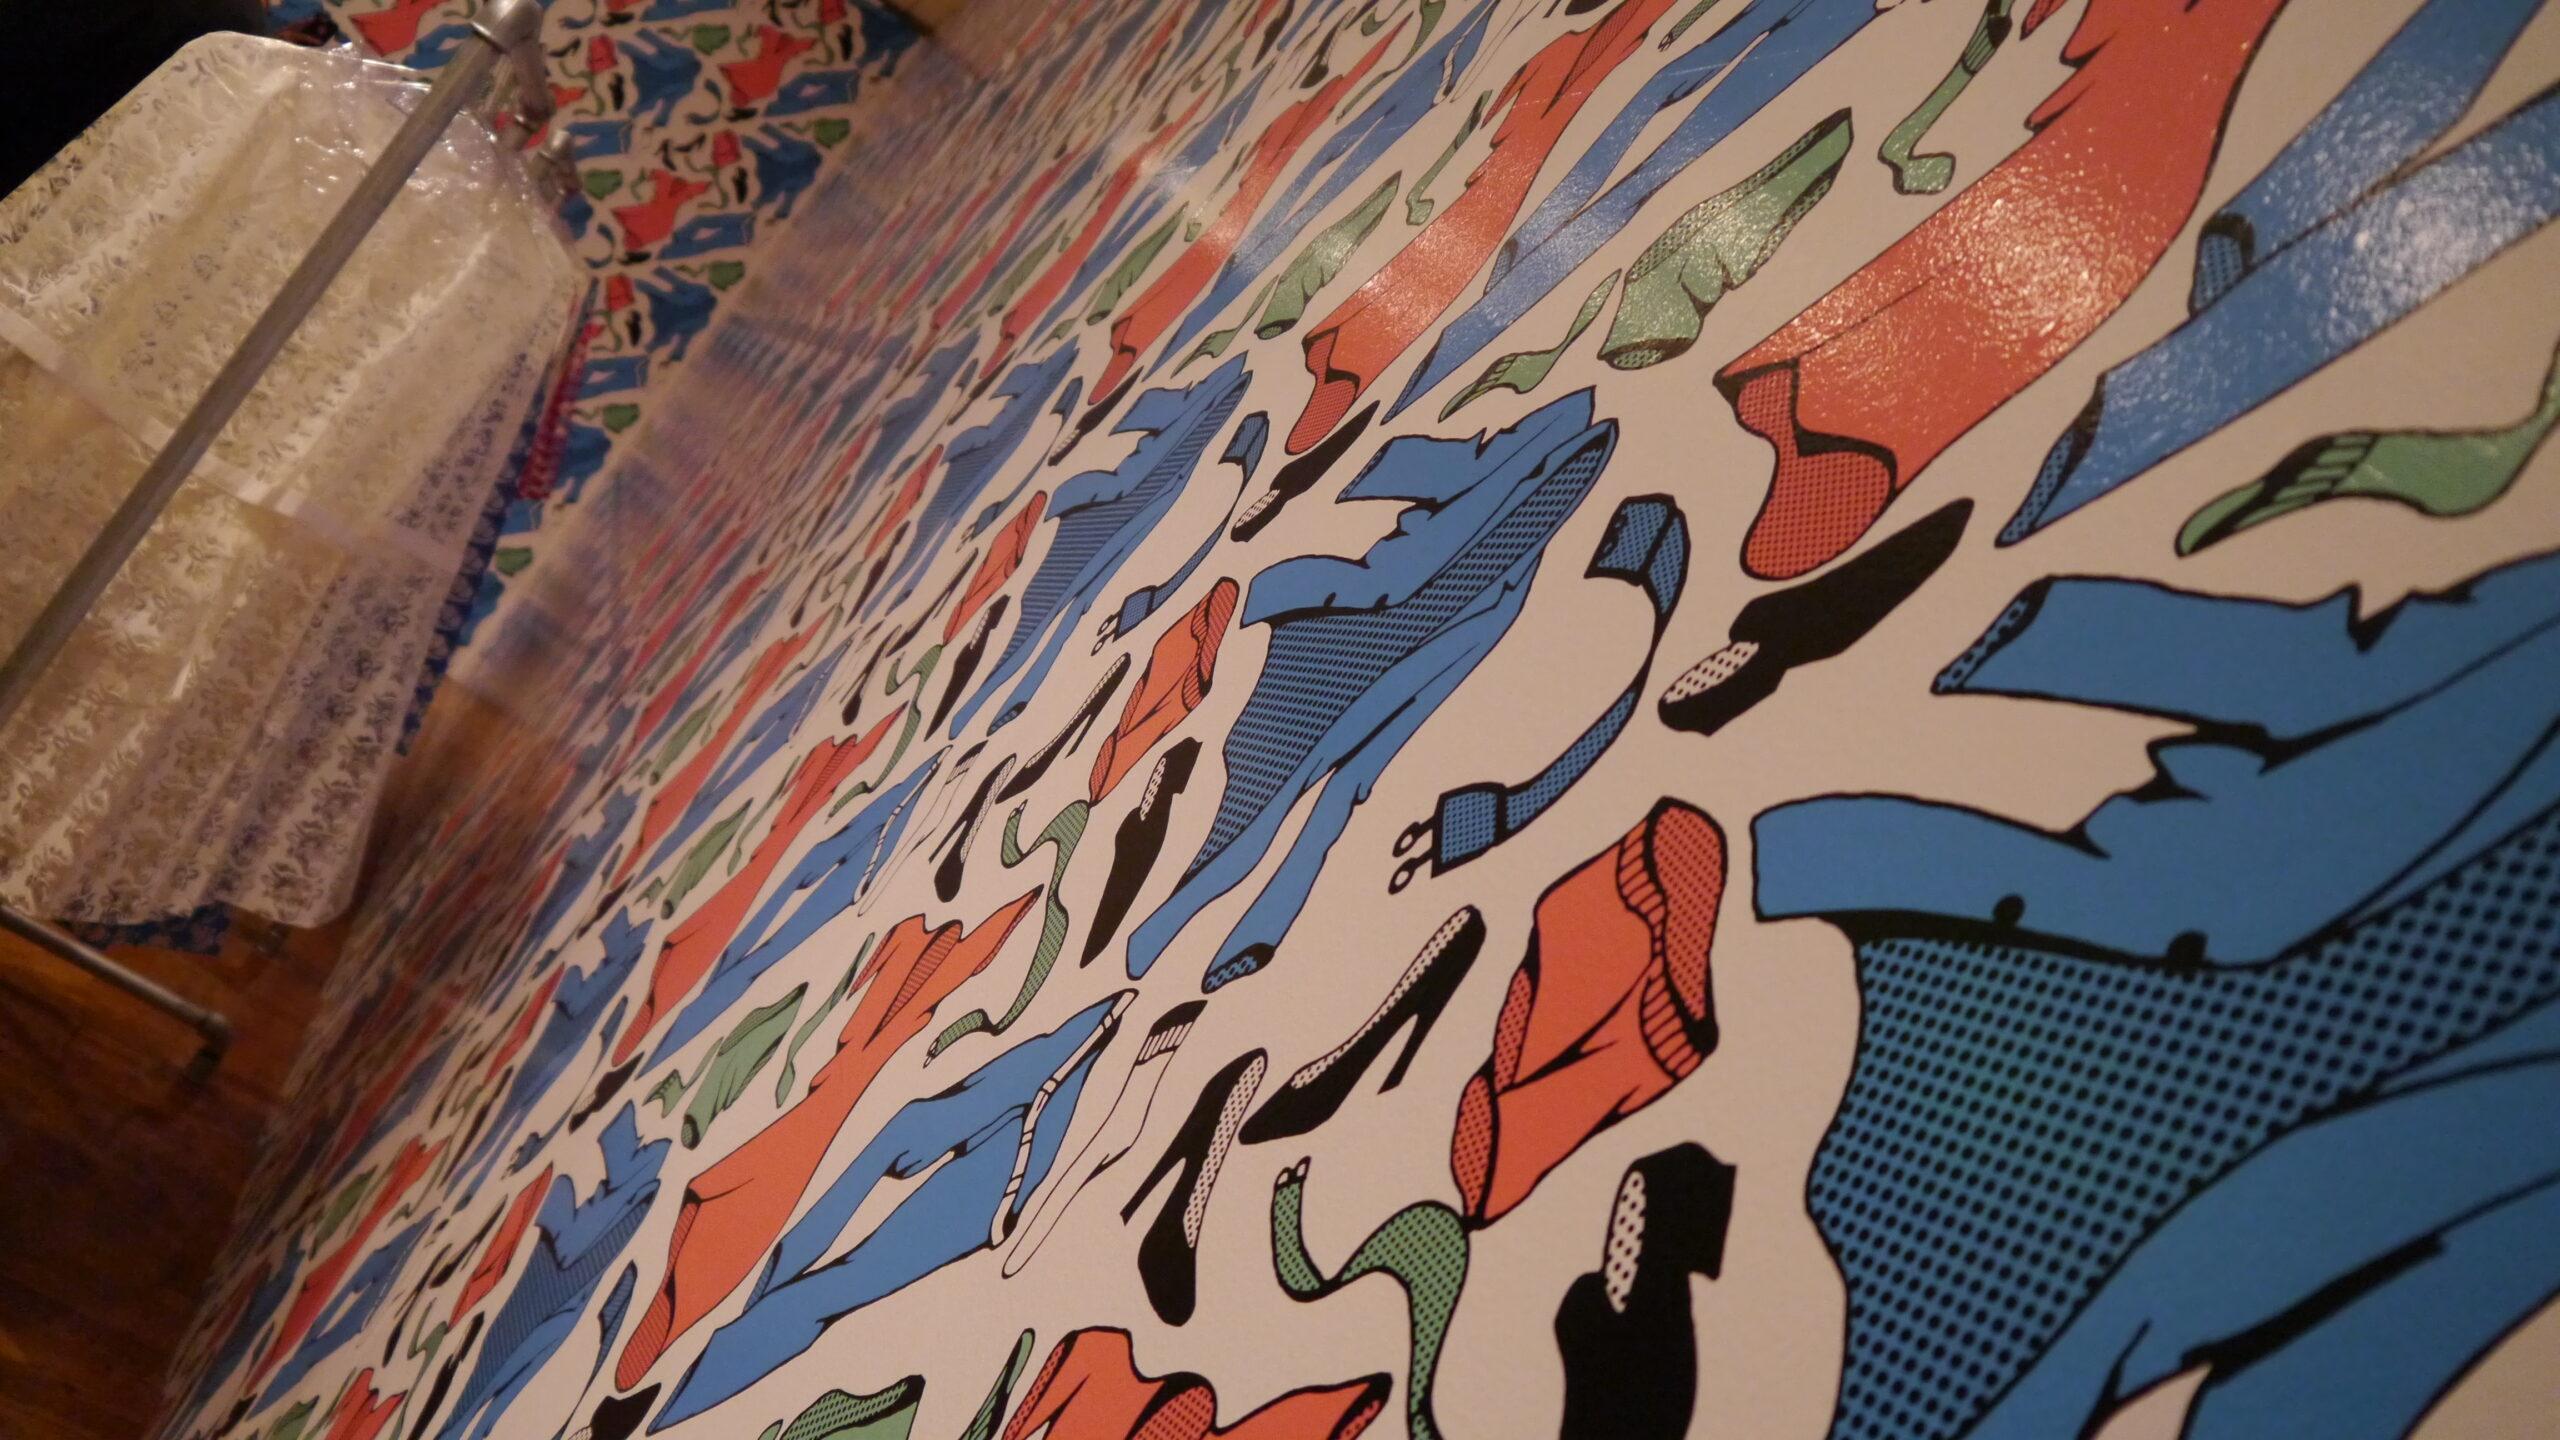 What's Pop-in' in Philadelphia's Museum of Art? [Photo Gallery]